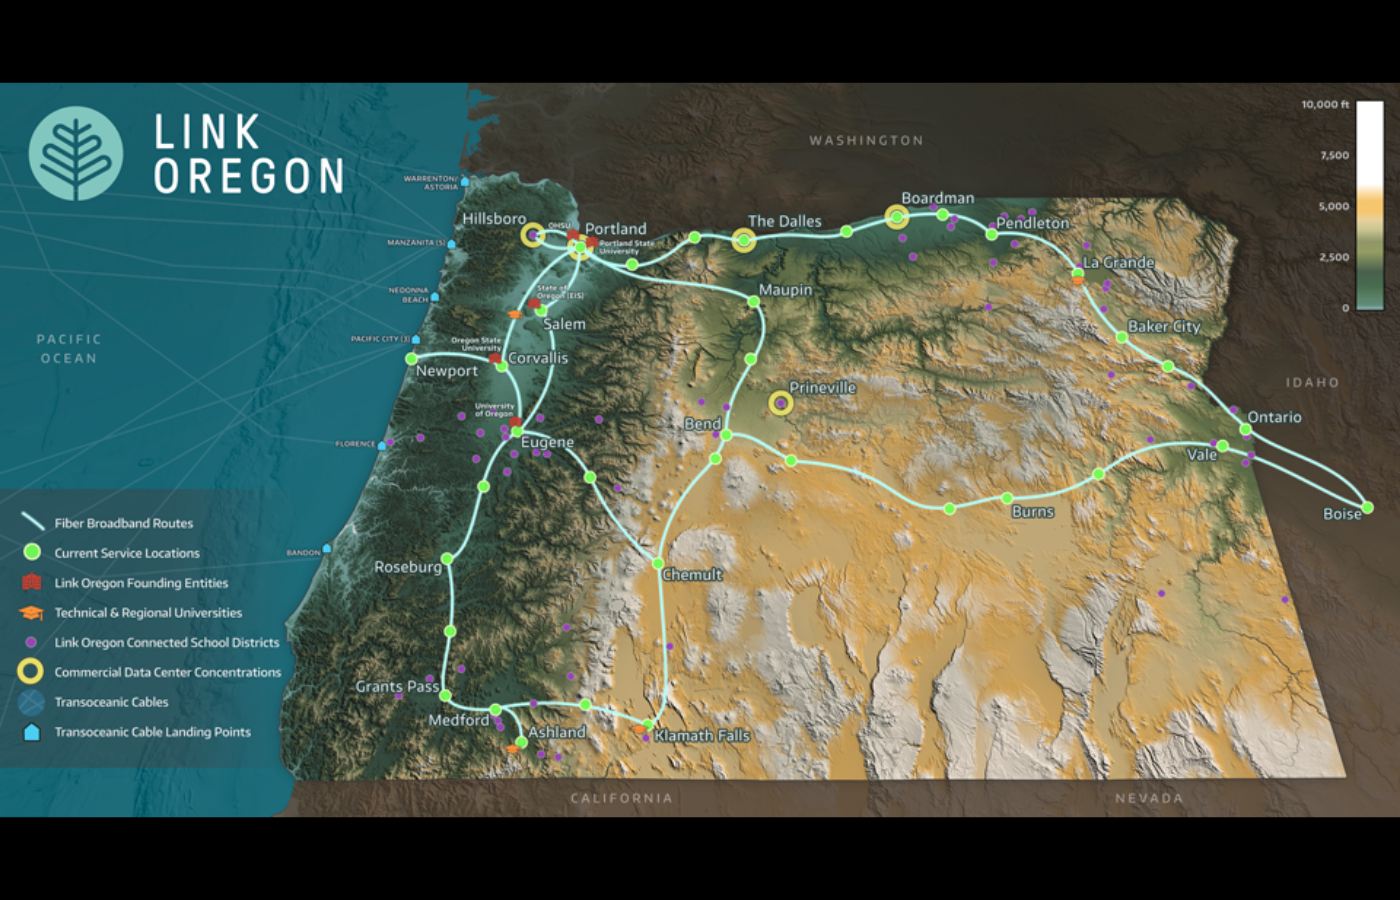 Link Oregon Broadband Network